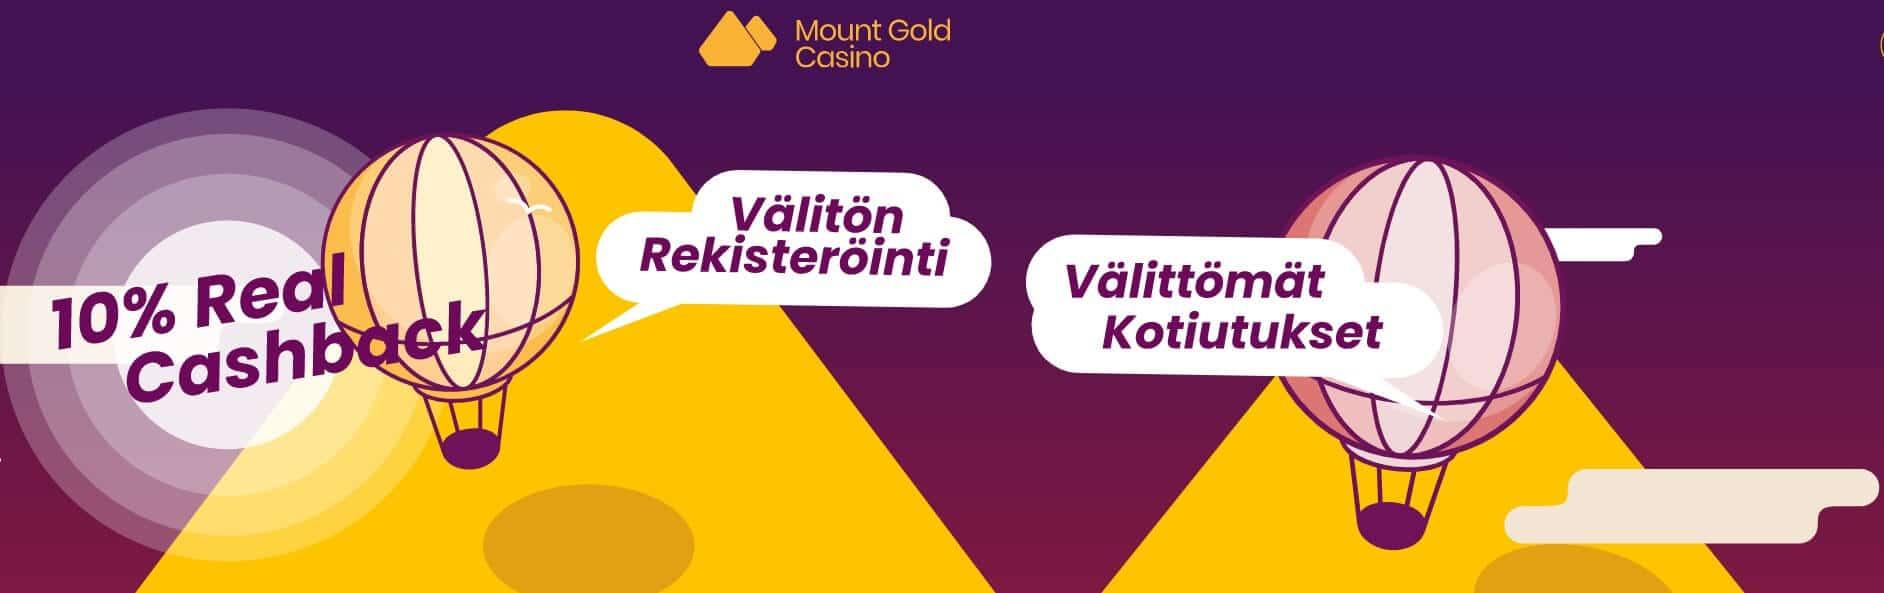 Mount Gold Casino arvostelu etusivu